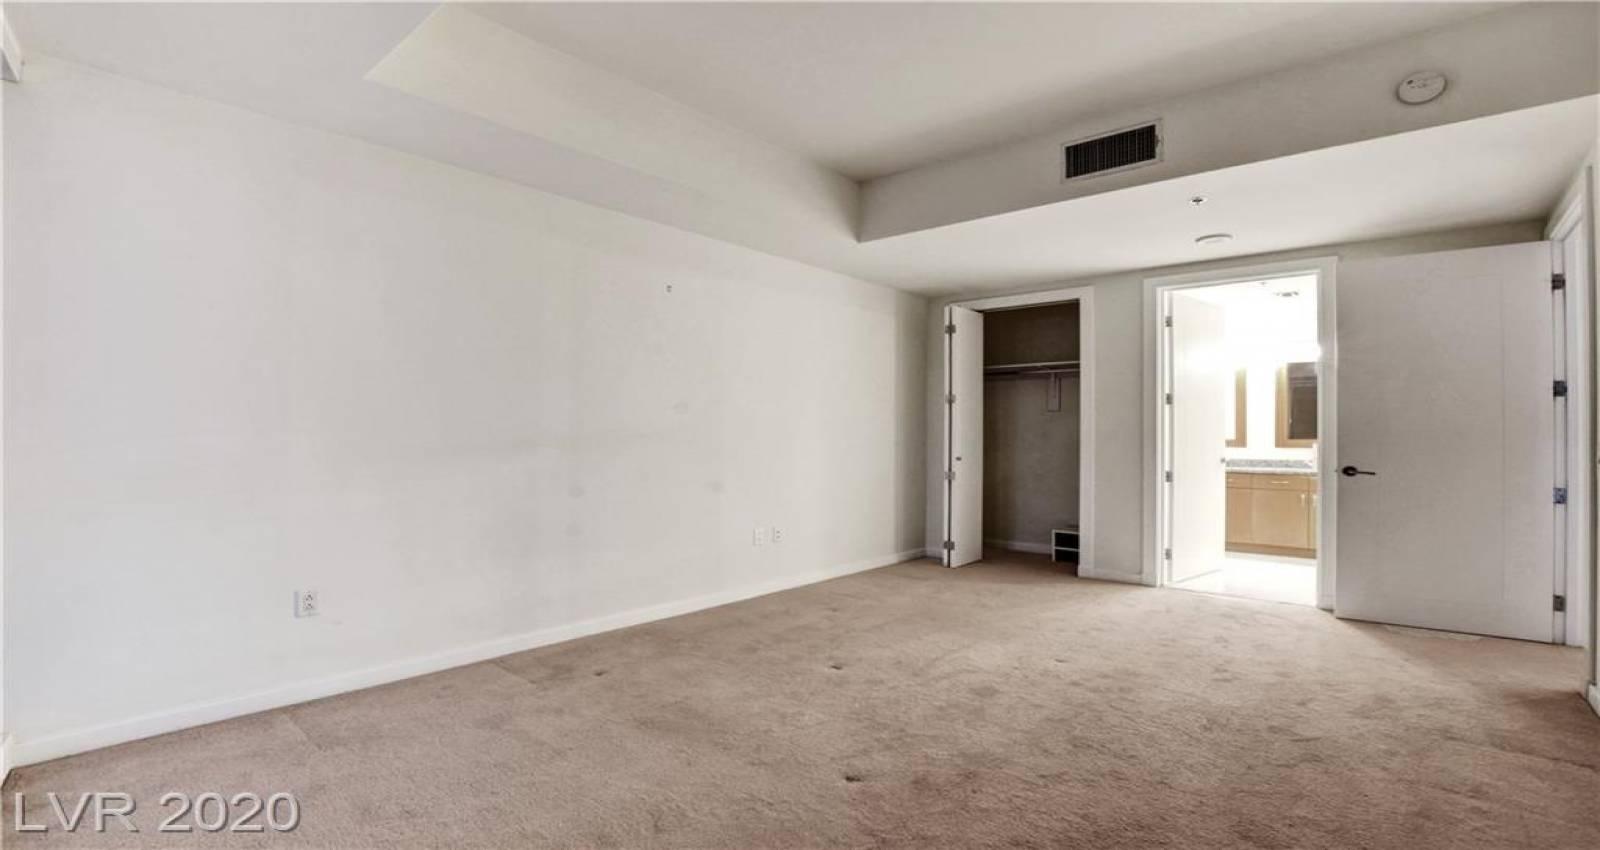 4575 Dean Martin, Las Vegas, Nevada 89103, 2 Bedrooms Bedrooms, 3 Rooms Rooms,1 BathroomBathrooms,Residential Rental,For Rent,Dean Martin,2186153